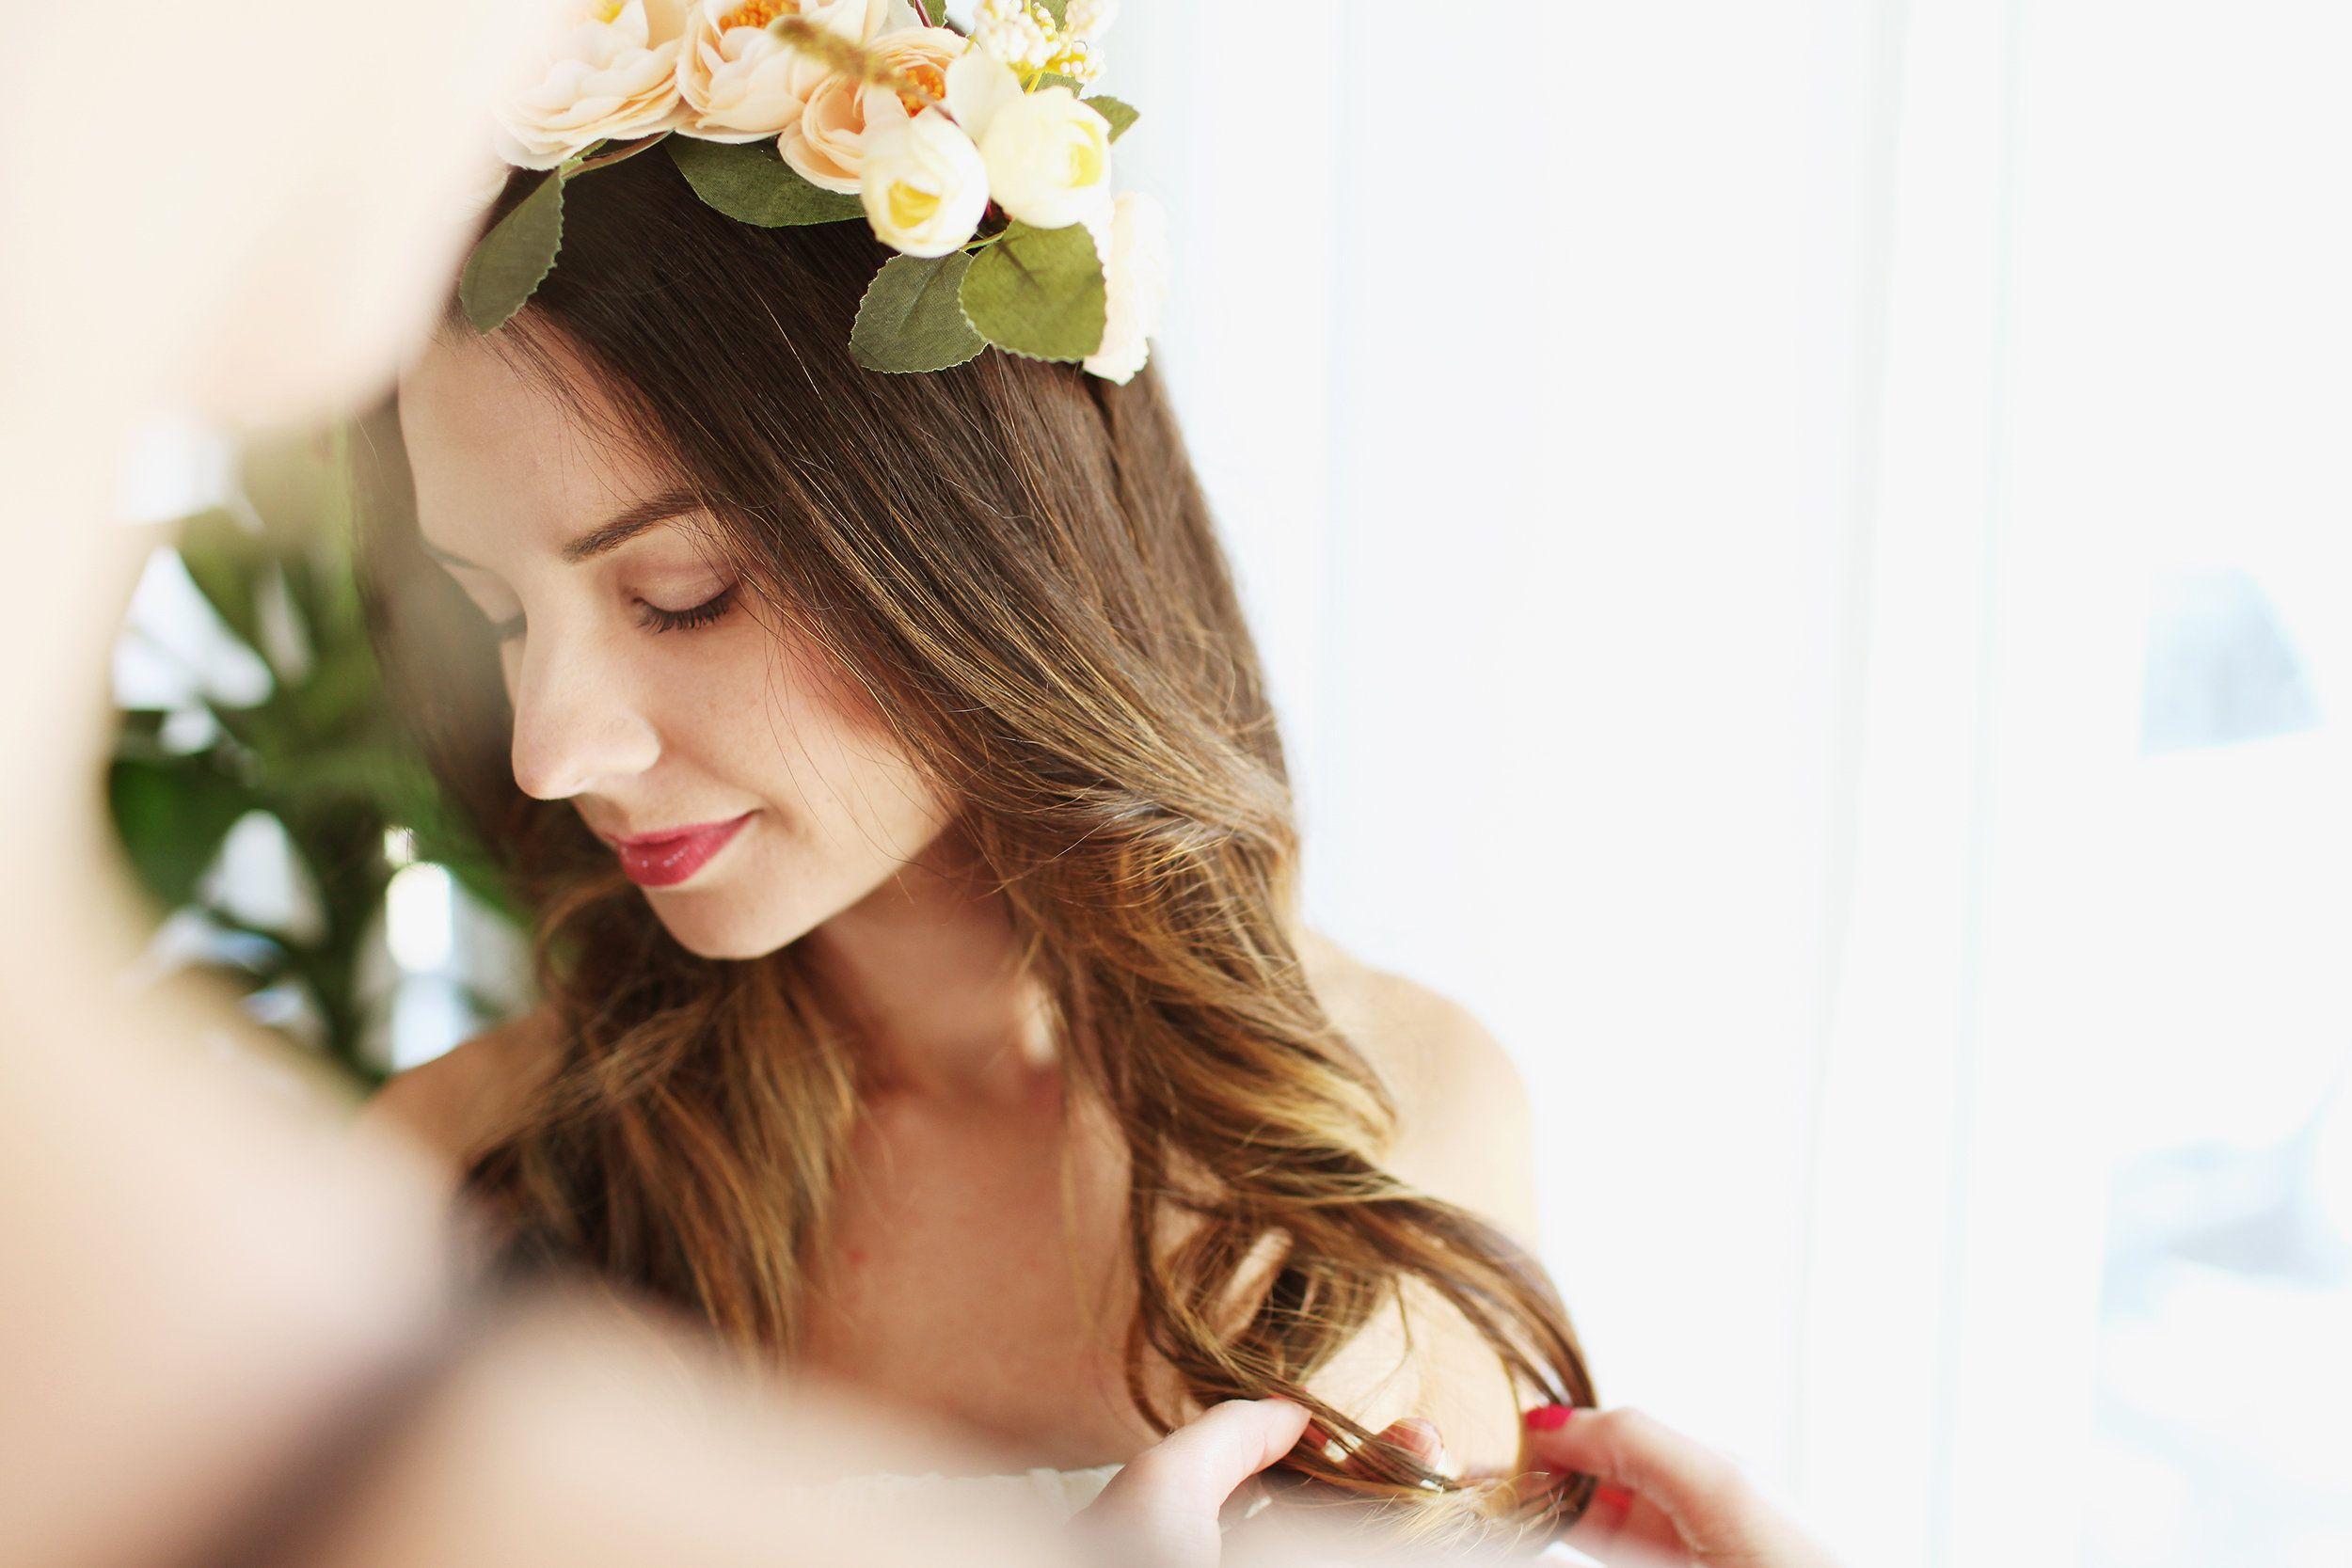 st augustine weddings. bardot beauty bar. pink bus. hair and makeup